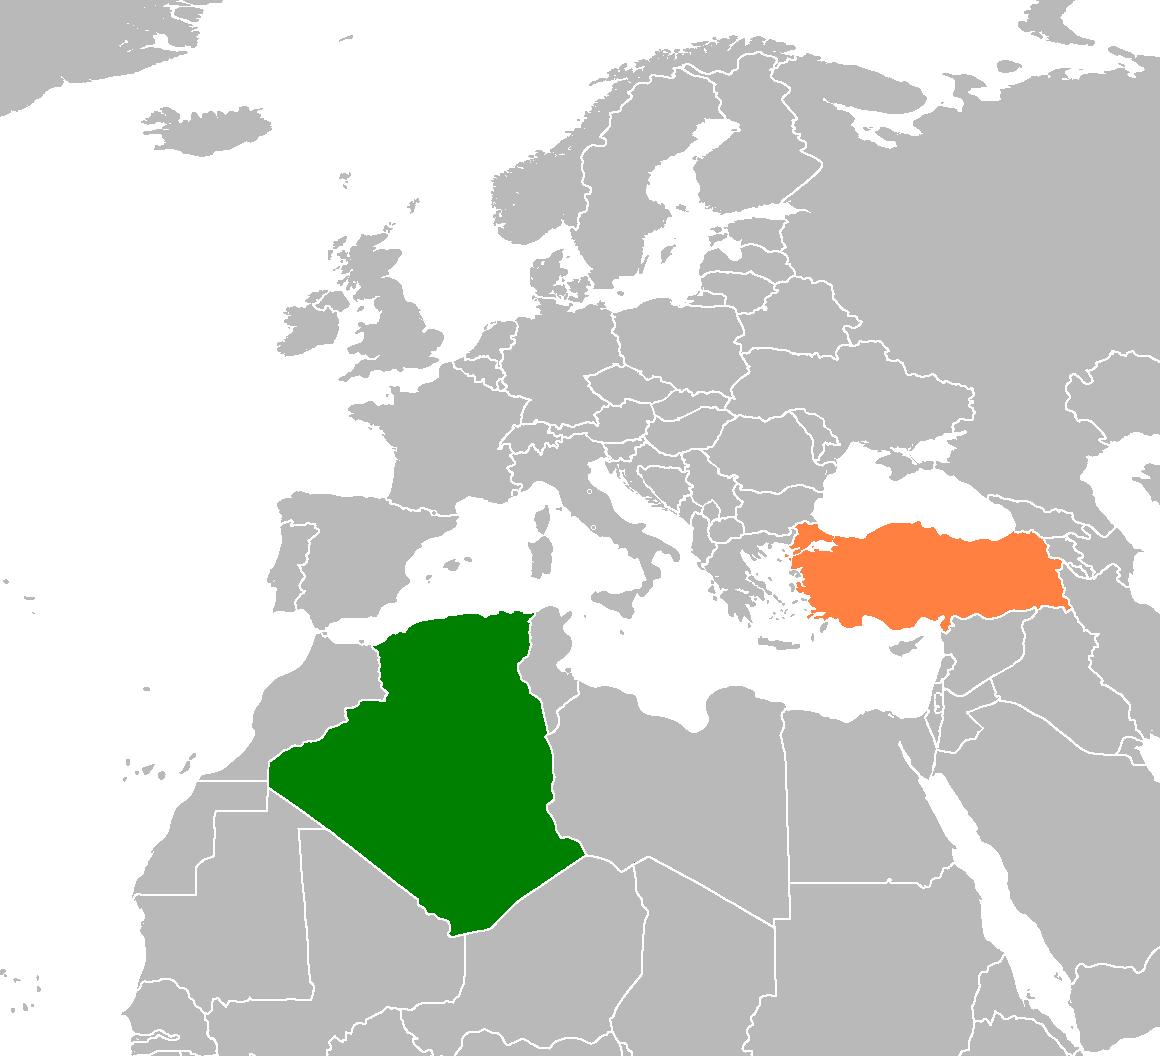 Algeria Location On World Map.Algeria Turkey Relations Wikipedia